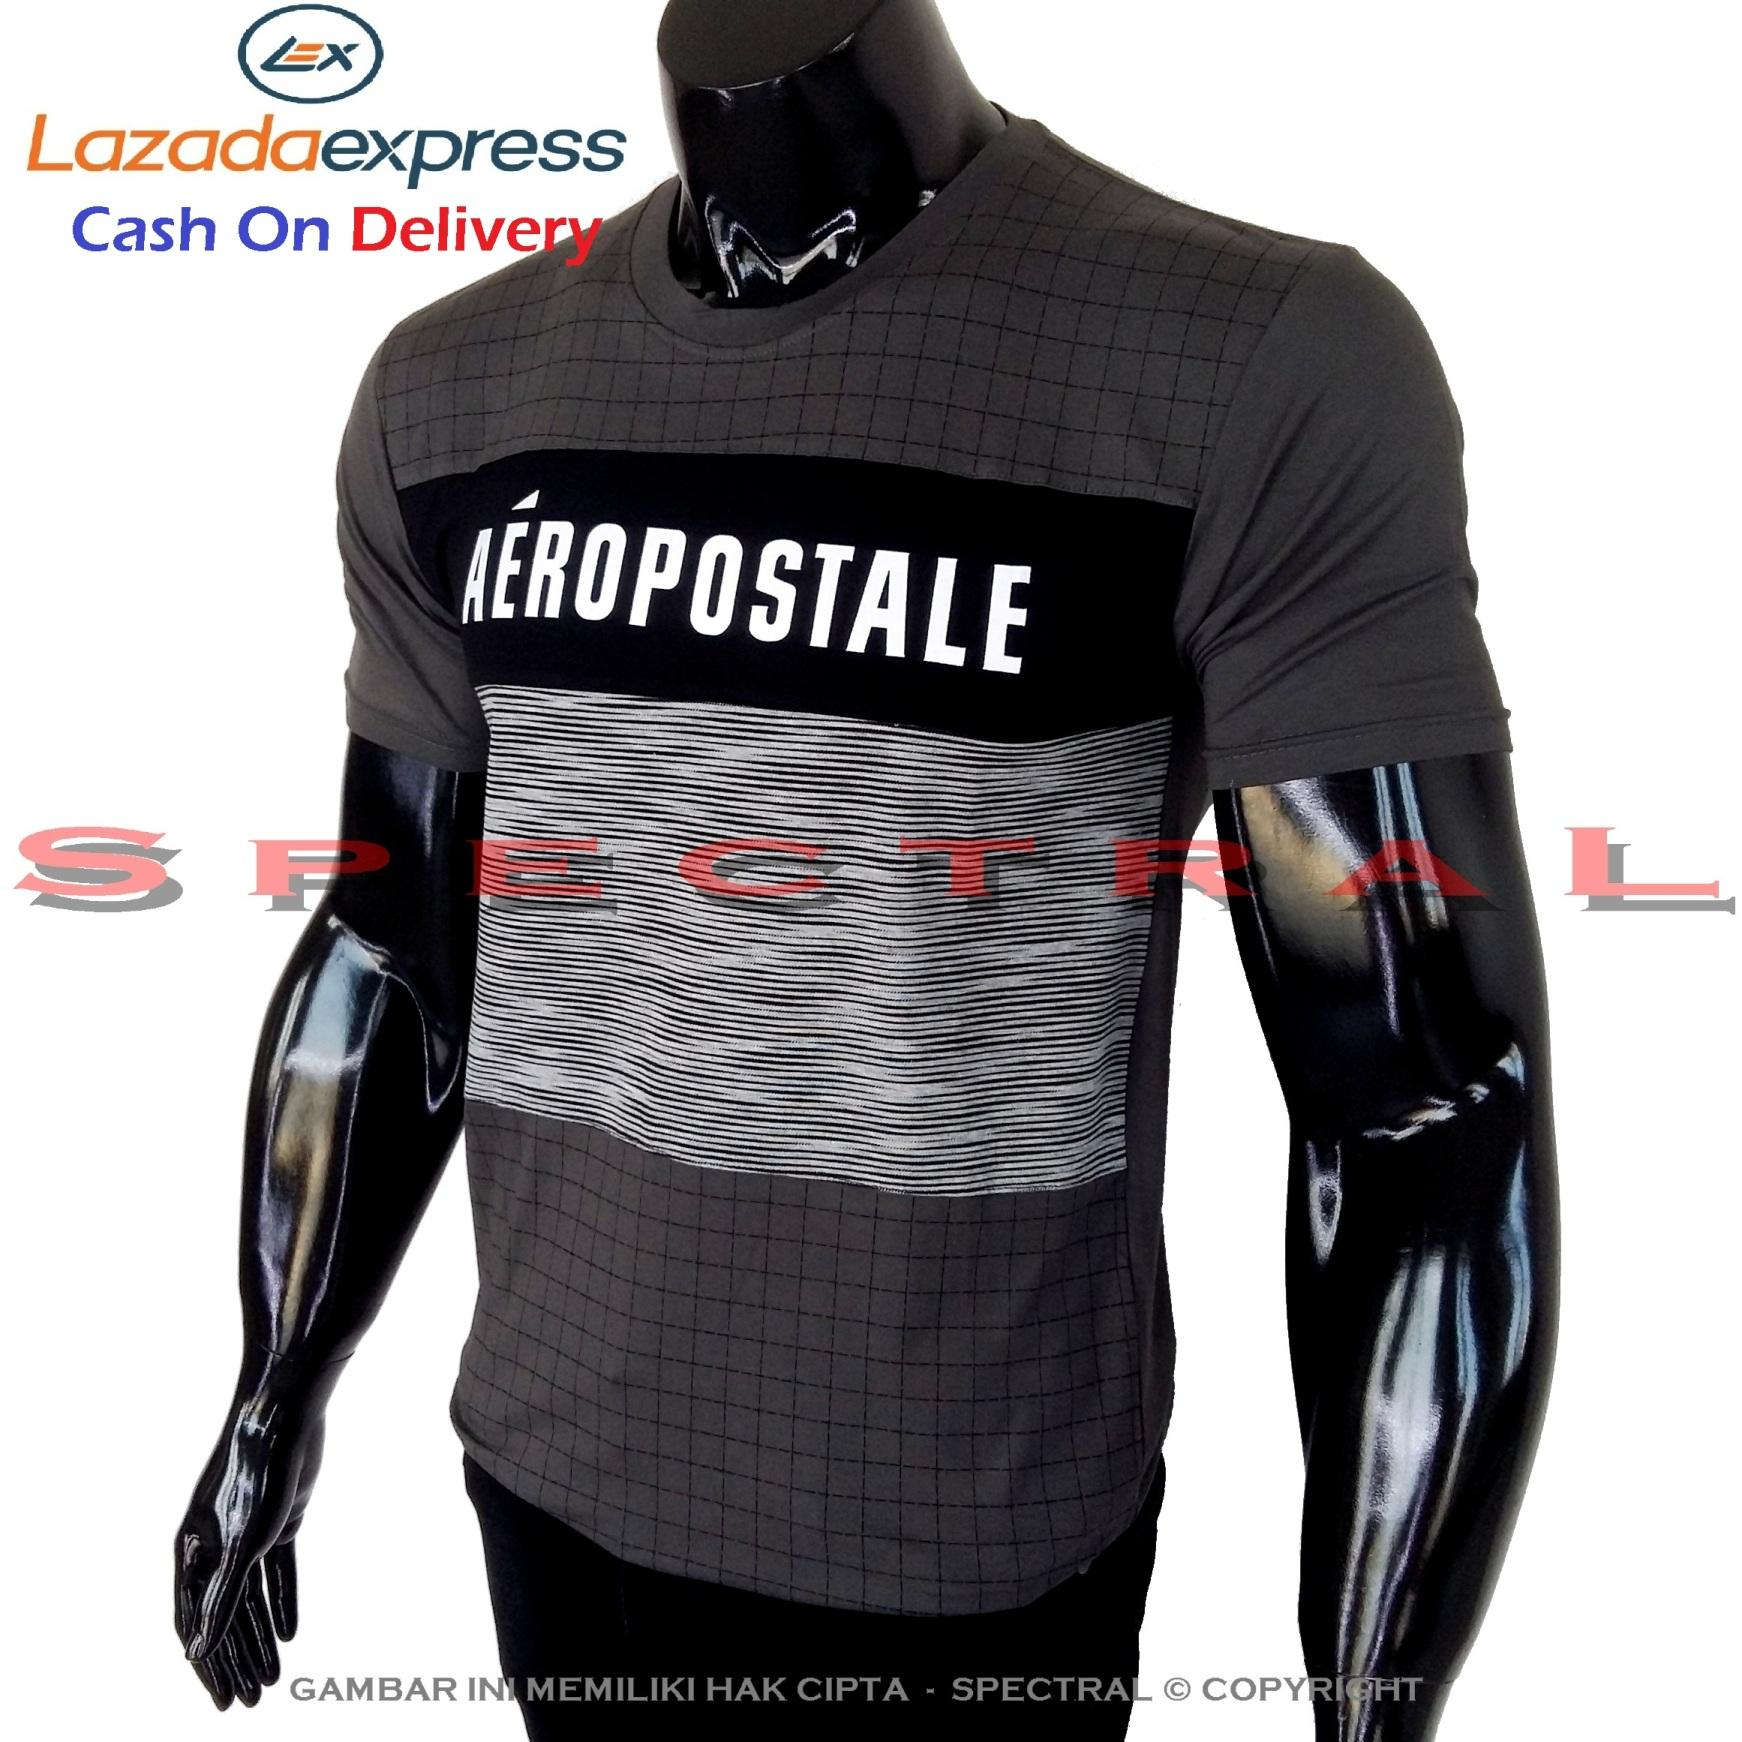 Spectral - Kaos Distro AEROPOSTALE Soft Rayon Viscose Lycra Pola M Fit To L Simple Fashionable Tida